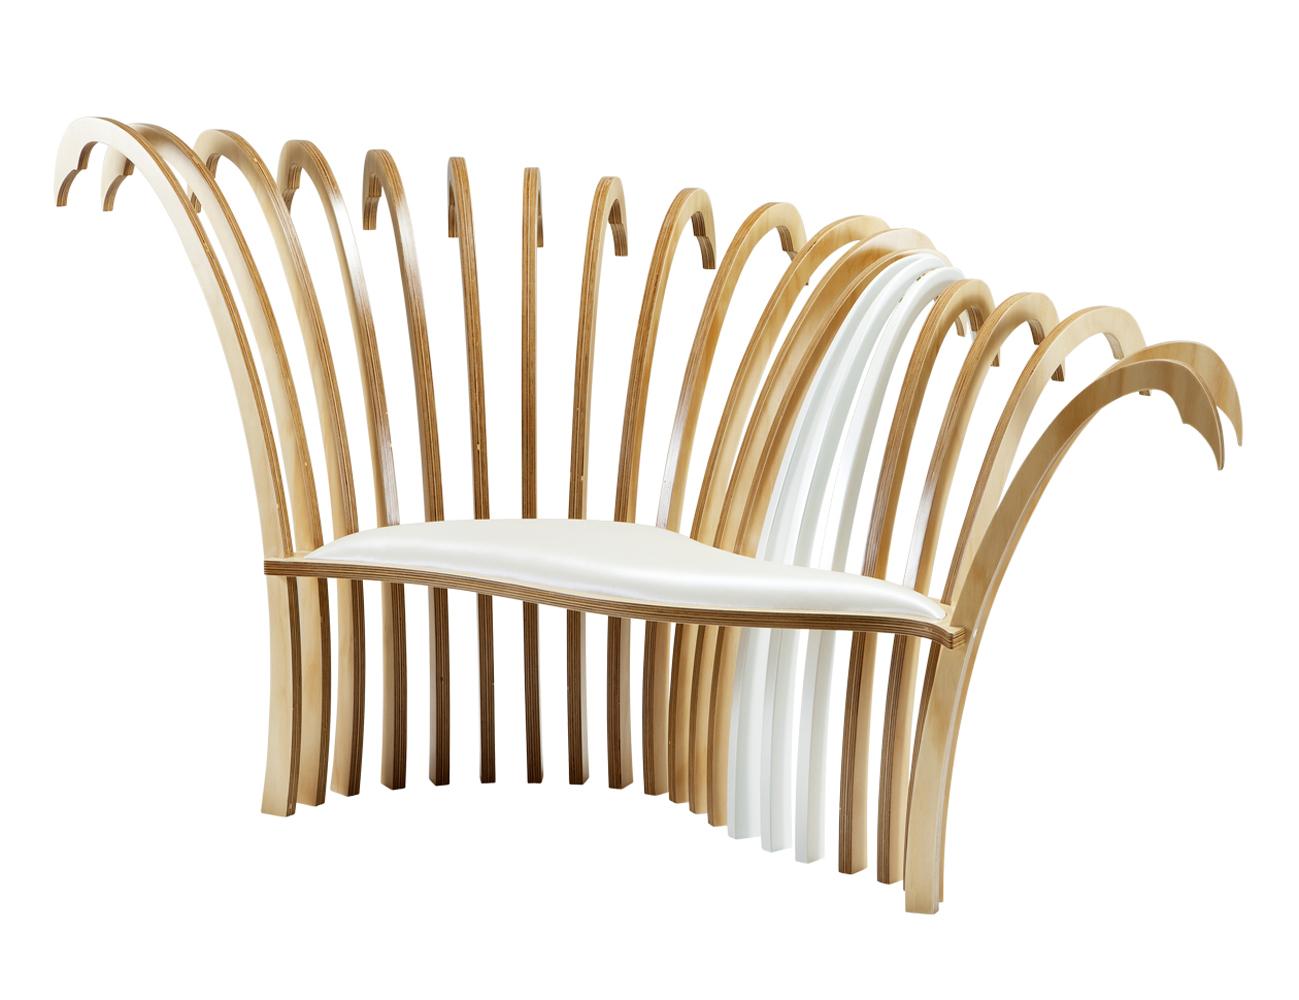 Little Cove A Custom Handmade Modern Avant Garde Art Deco Statement Chair